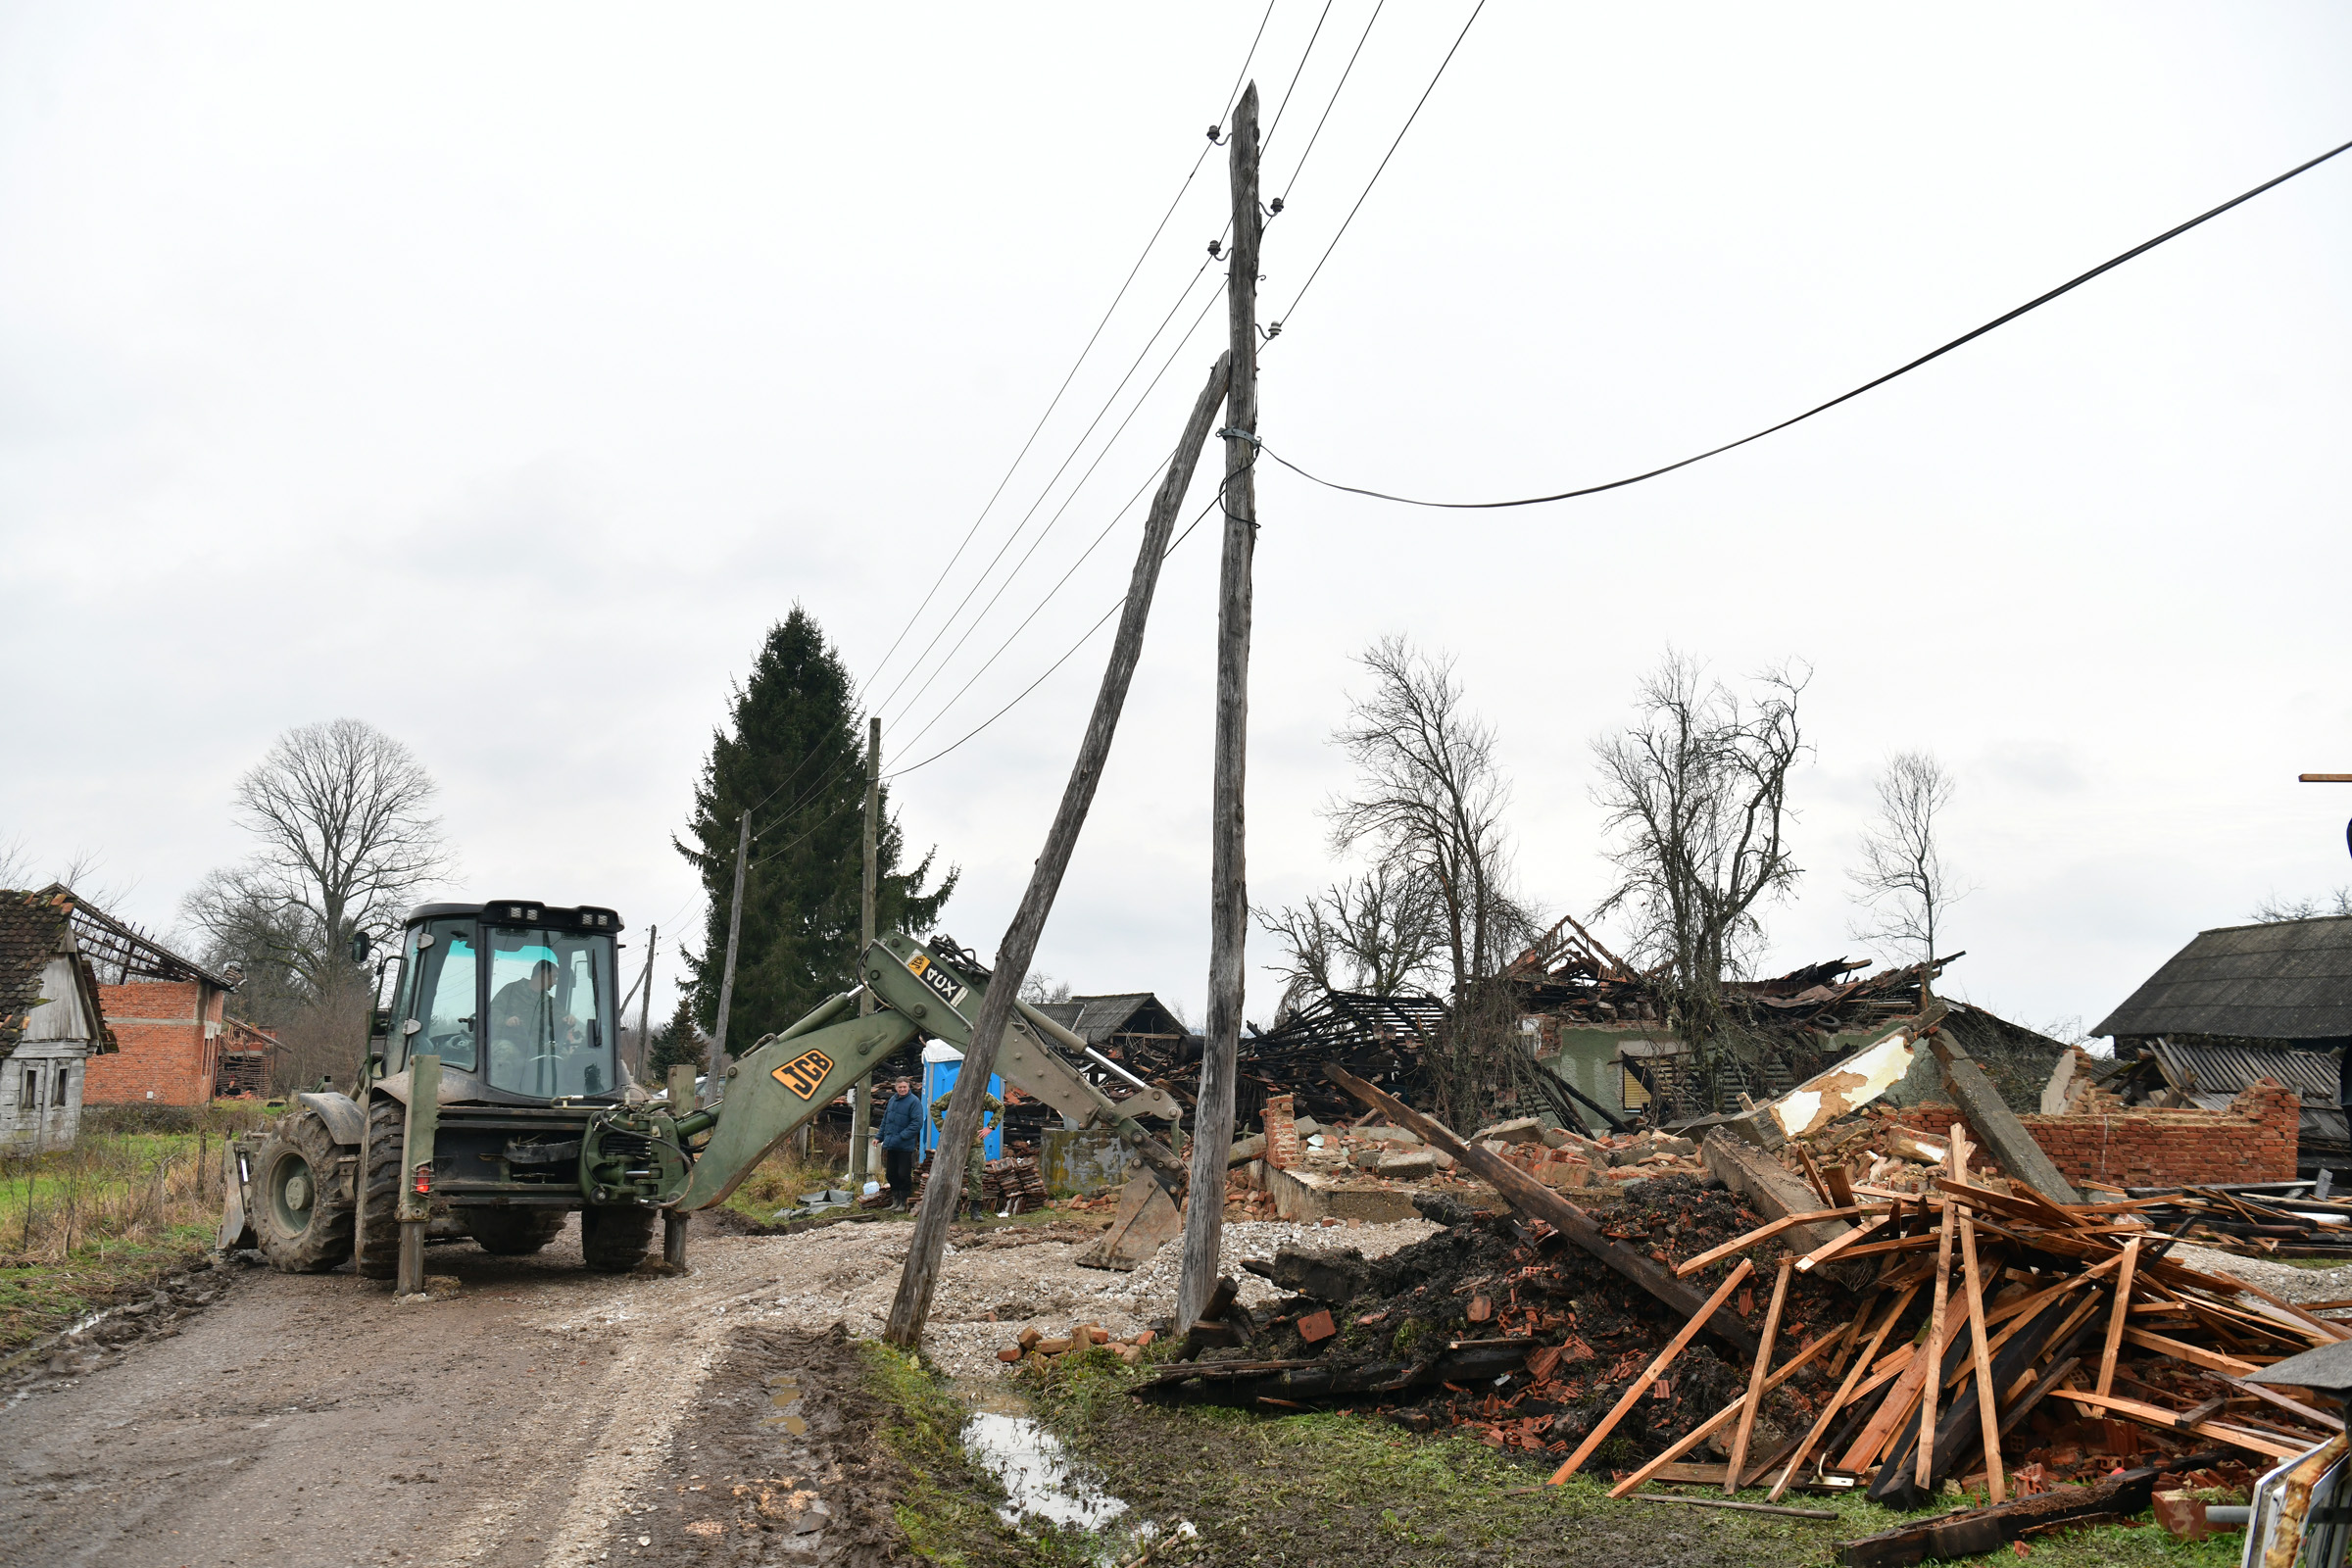 Hrvatska vojska pomaže potresom pogođenom gradu Petrinji i Sisku